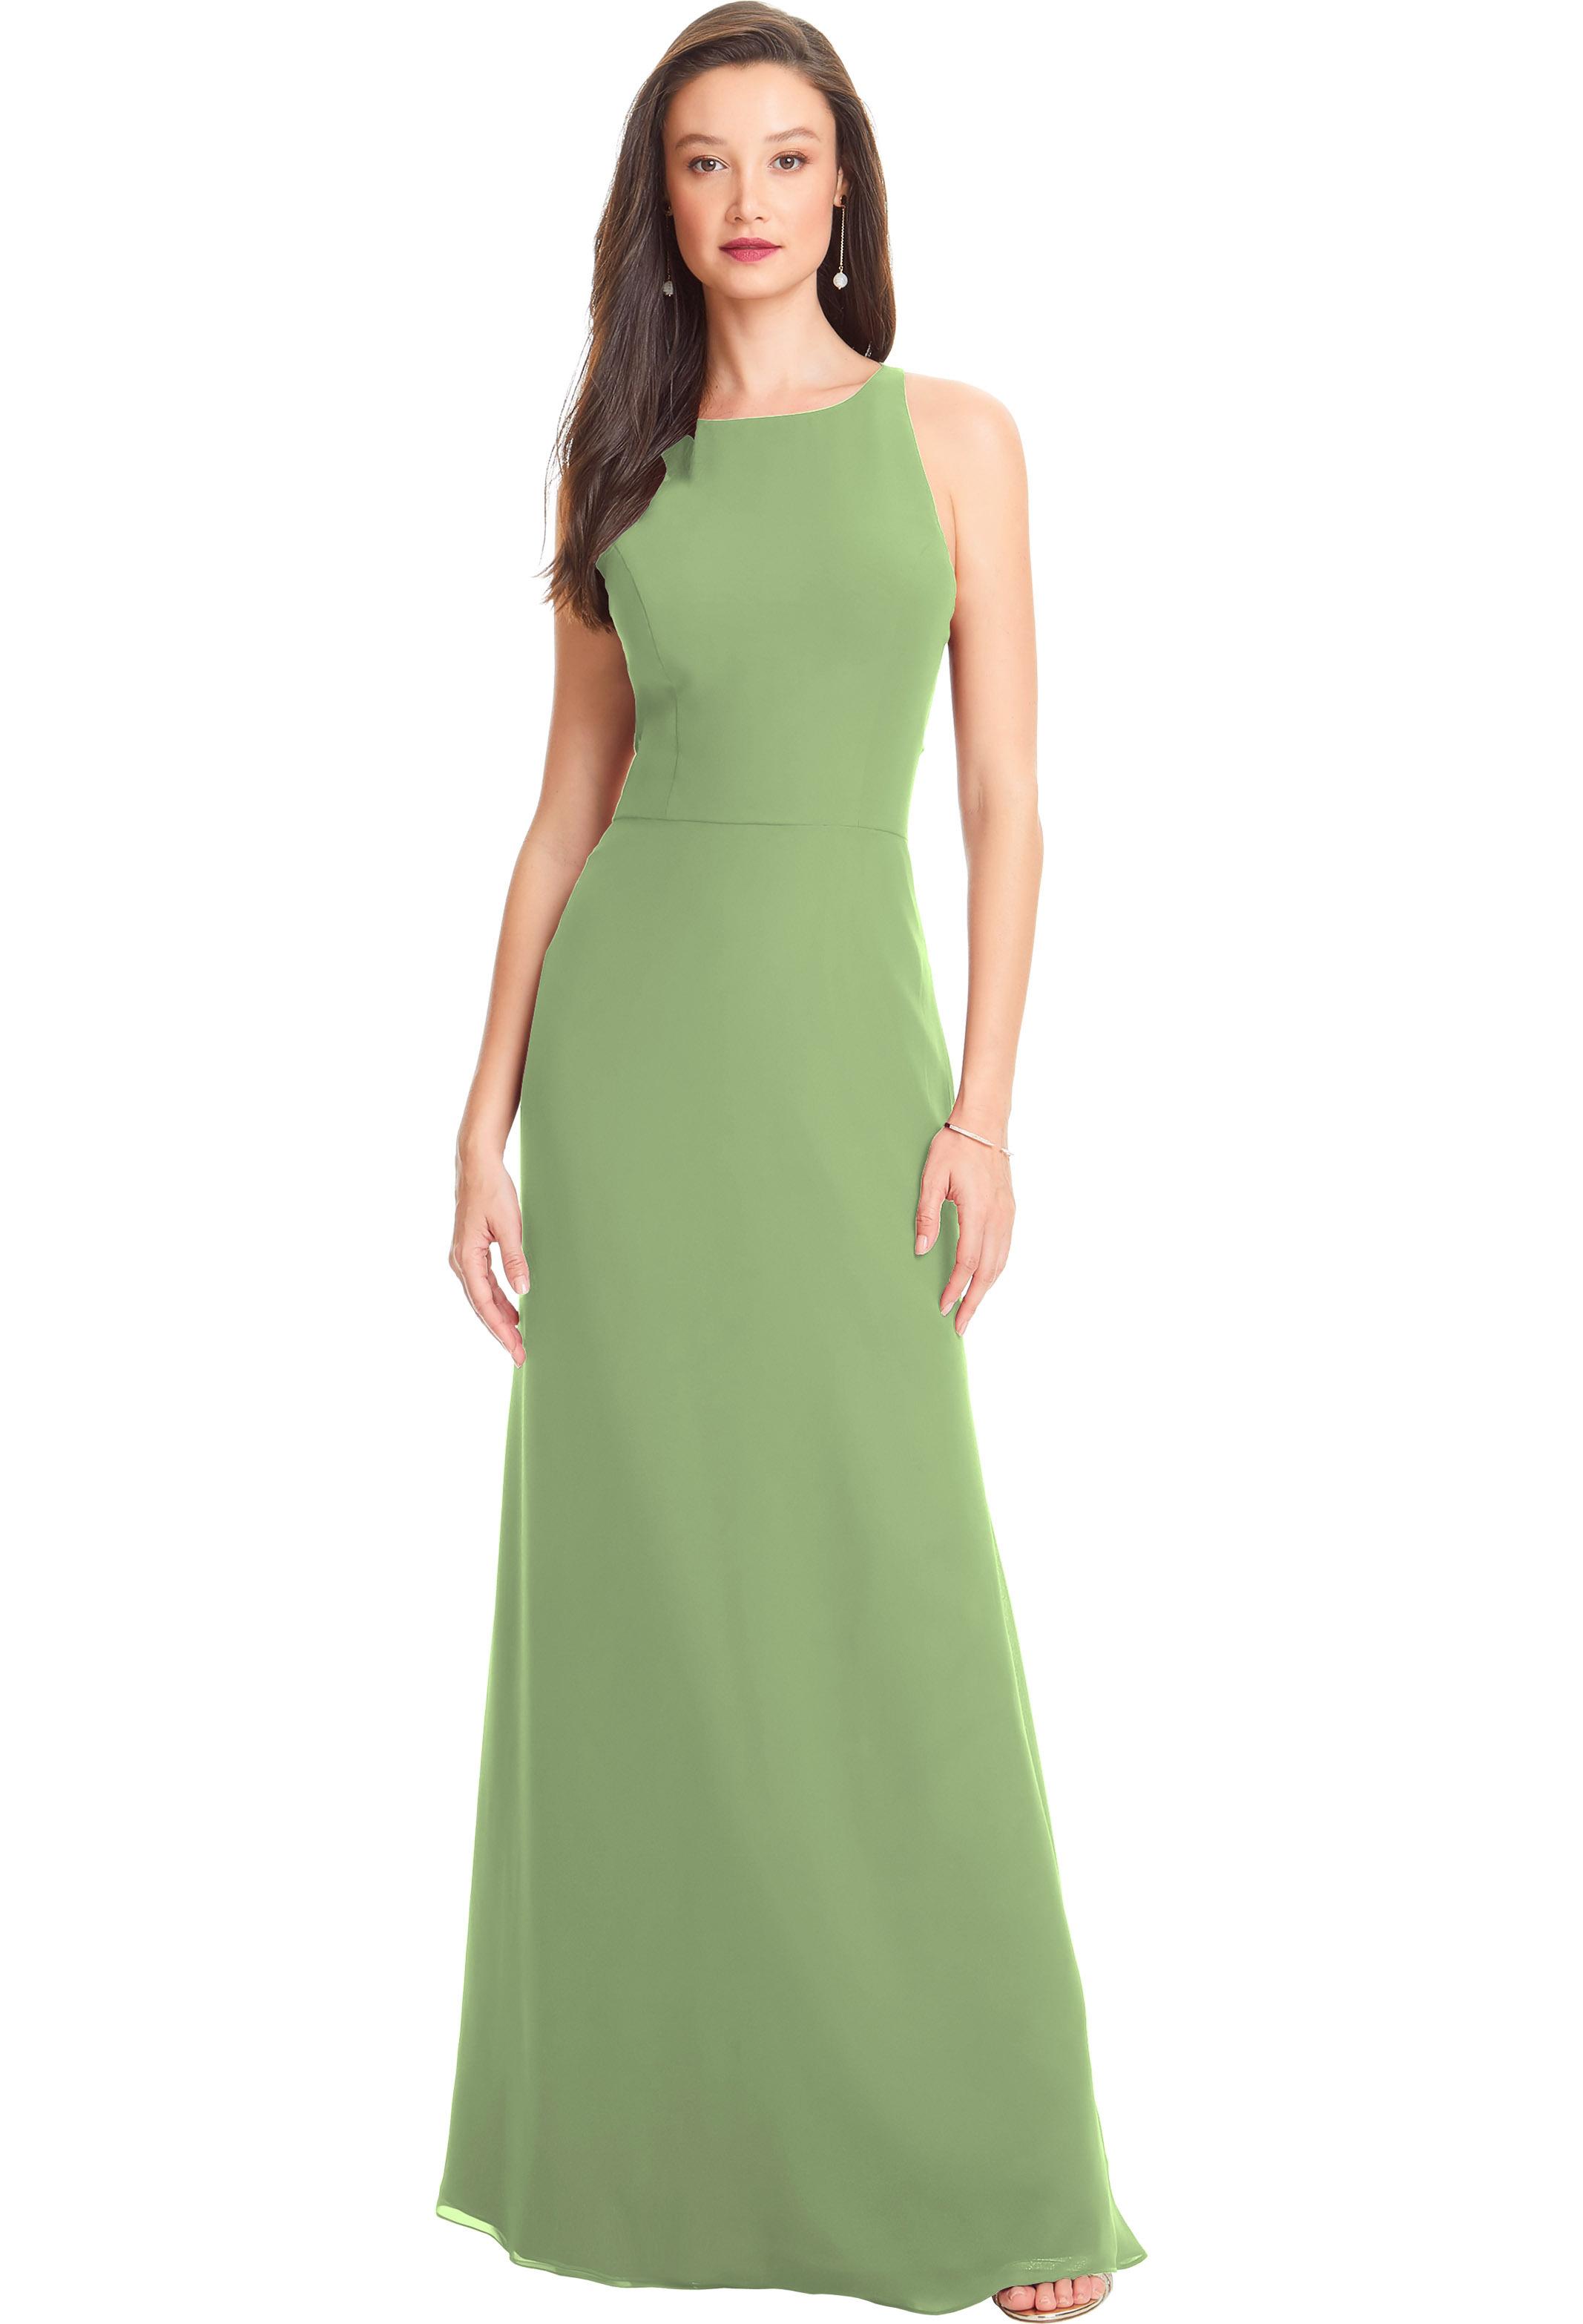 Bill Levkoff PISTACHIO Chiffon Sleeveless A-line gown, $210.00 Front